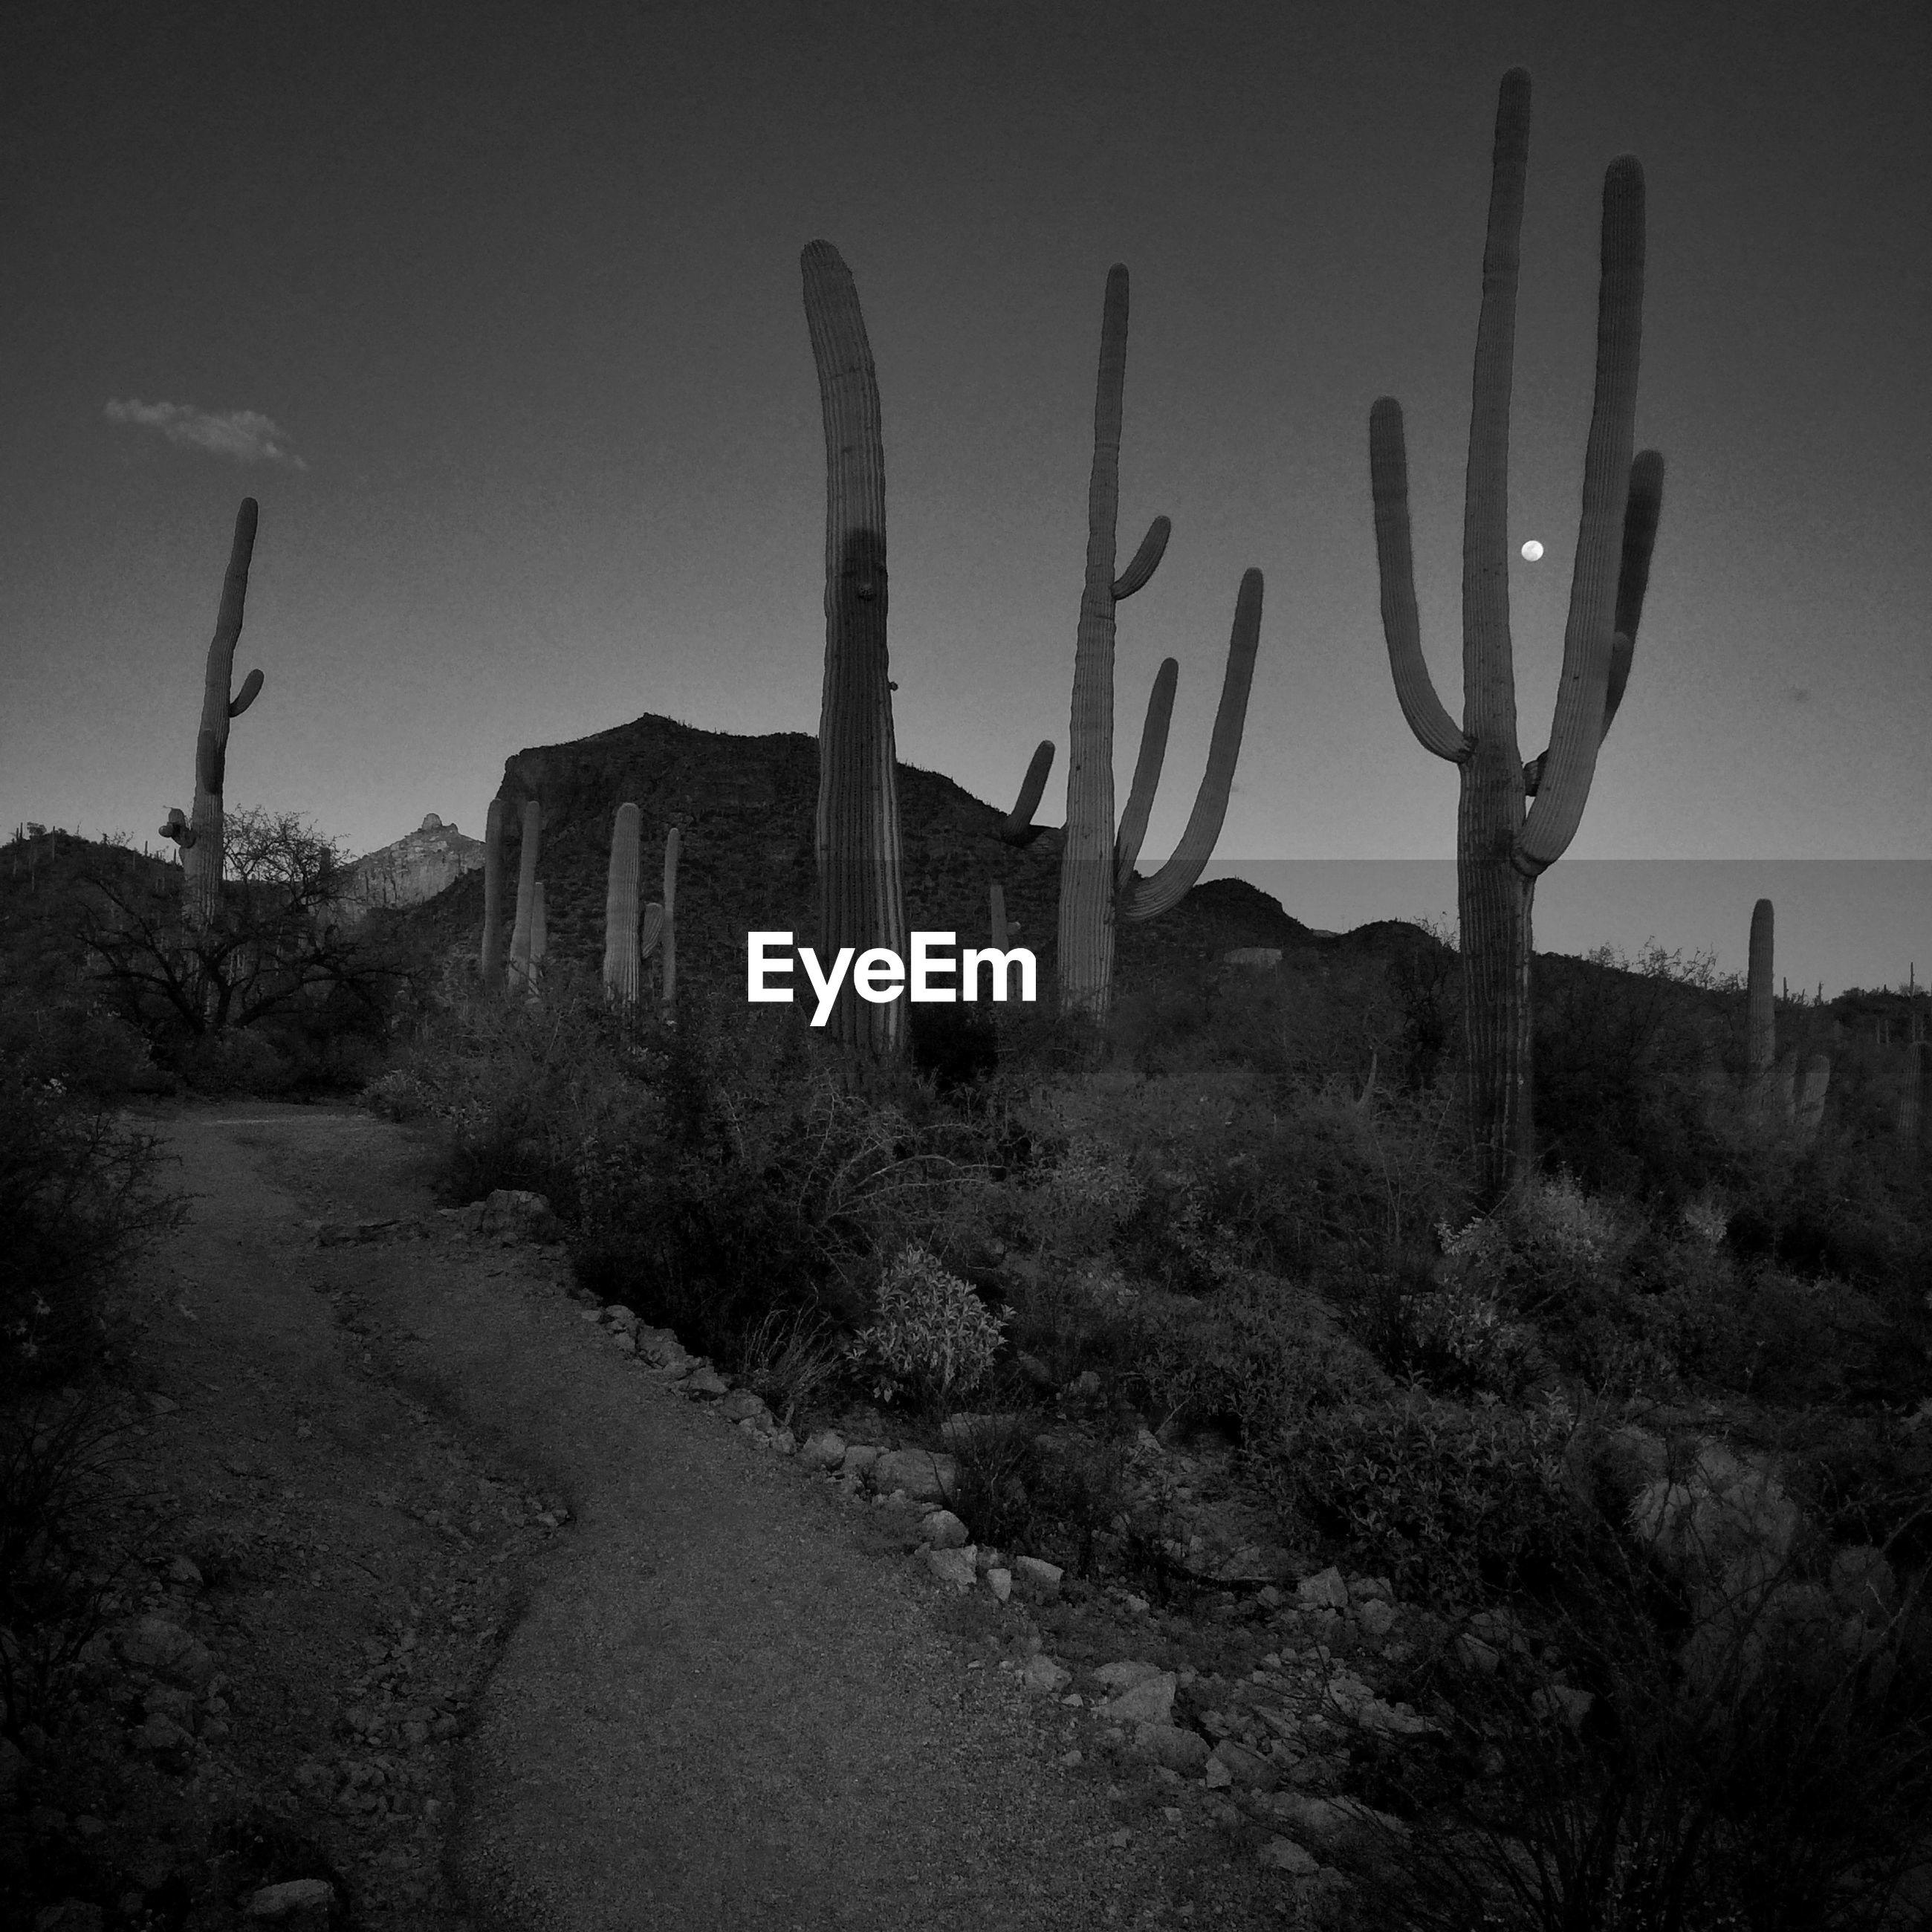 Saguaro cacti at dusk